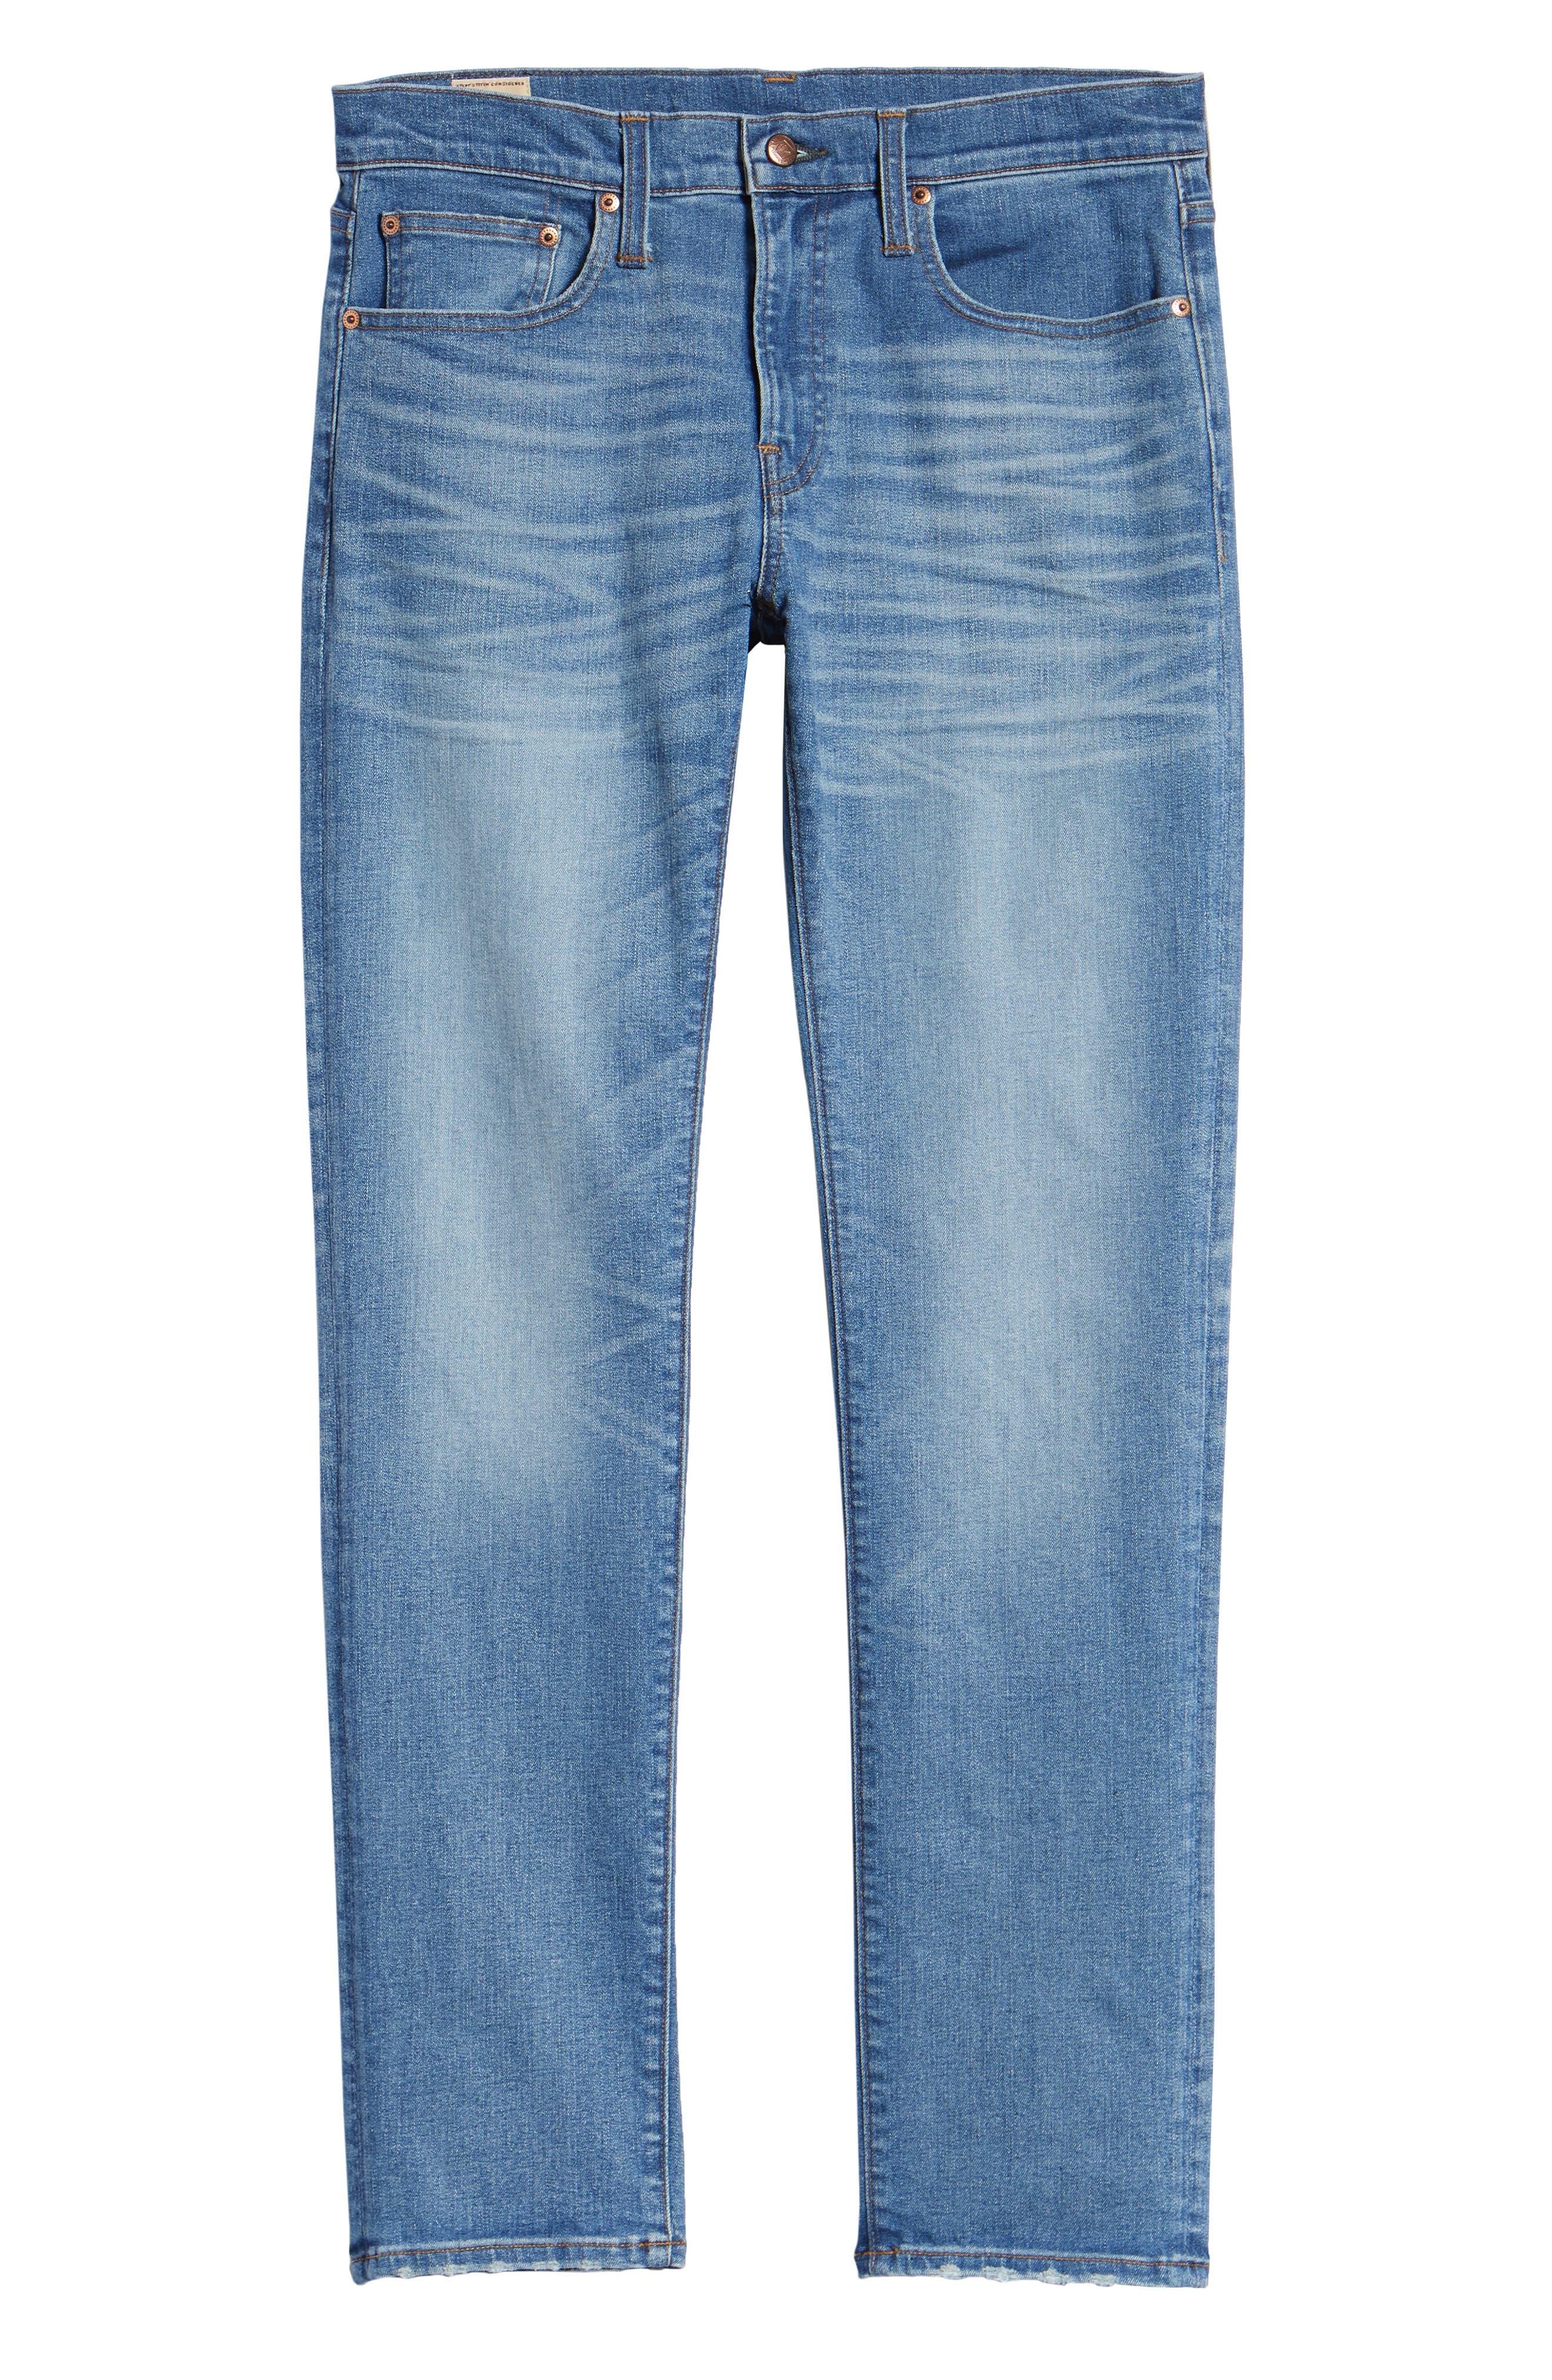 484 Slim Fit Distressed Stretch Jeans,                             Alternate thumbnail 6, color,                             STOCKTON WASH